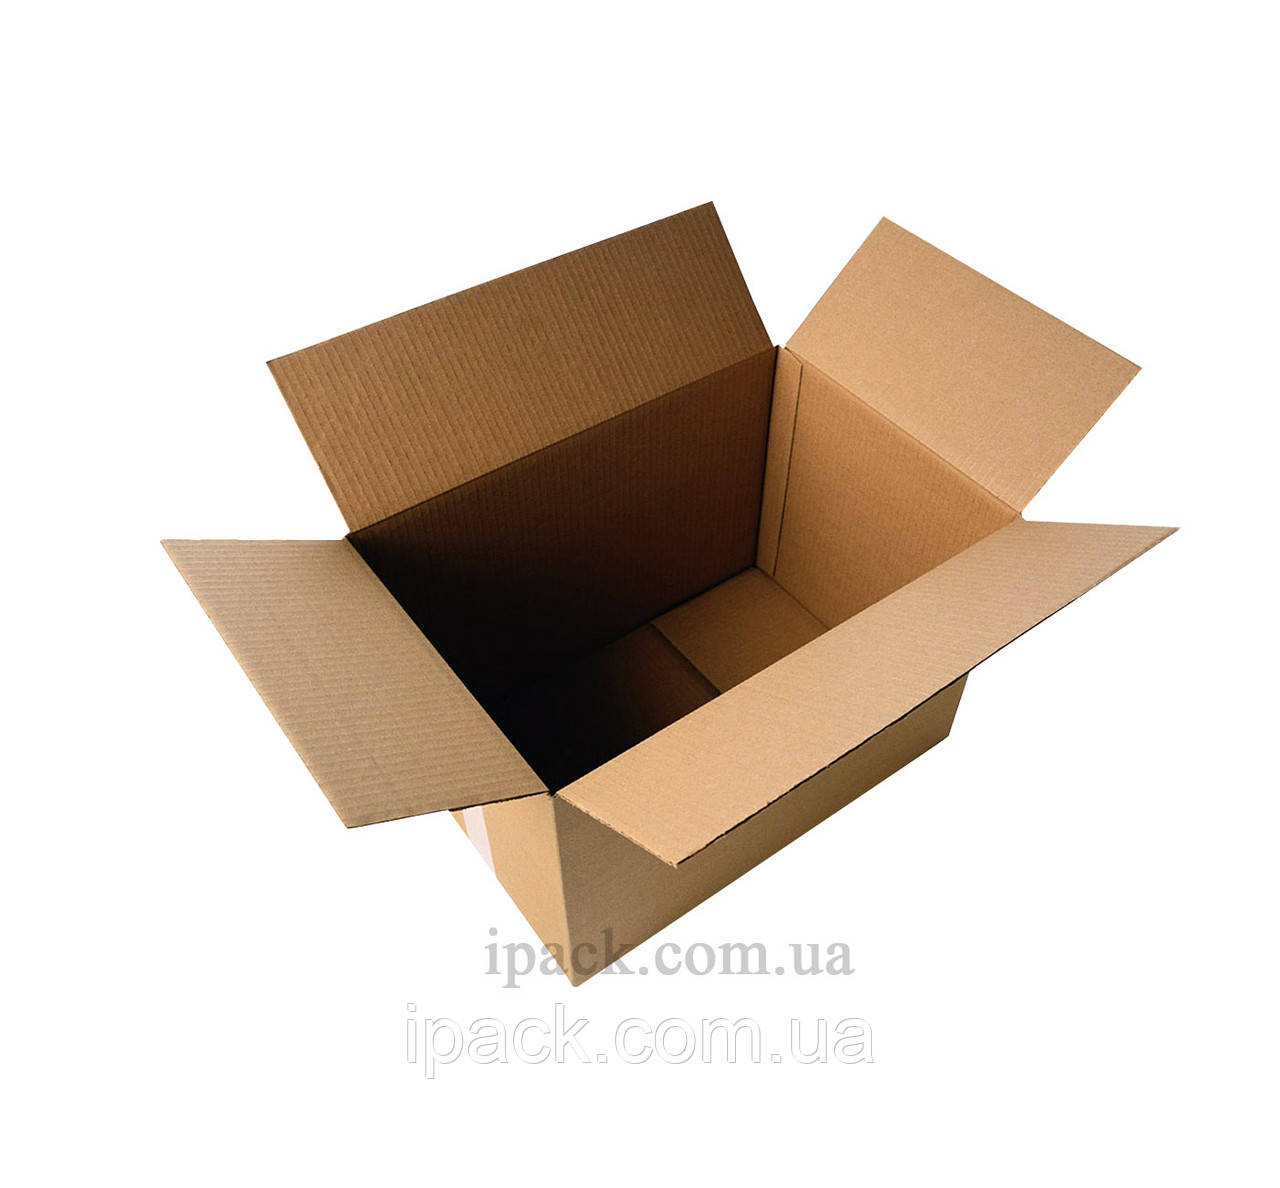 Гофроящик 725*460*500 мм, бурый, четырехклапанный картонный короб